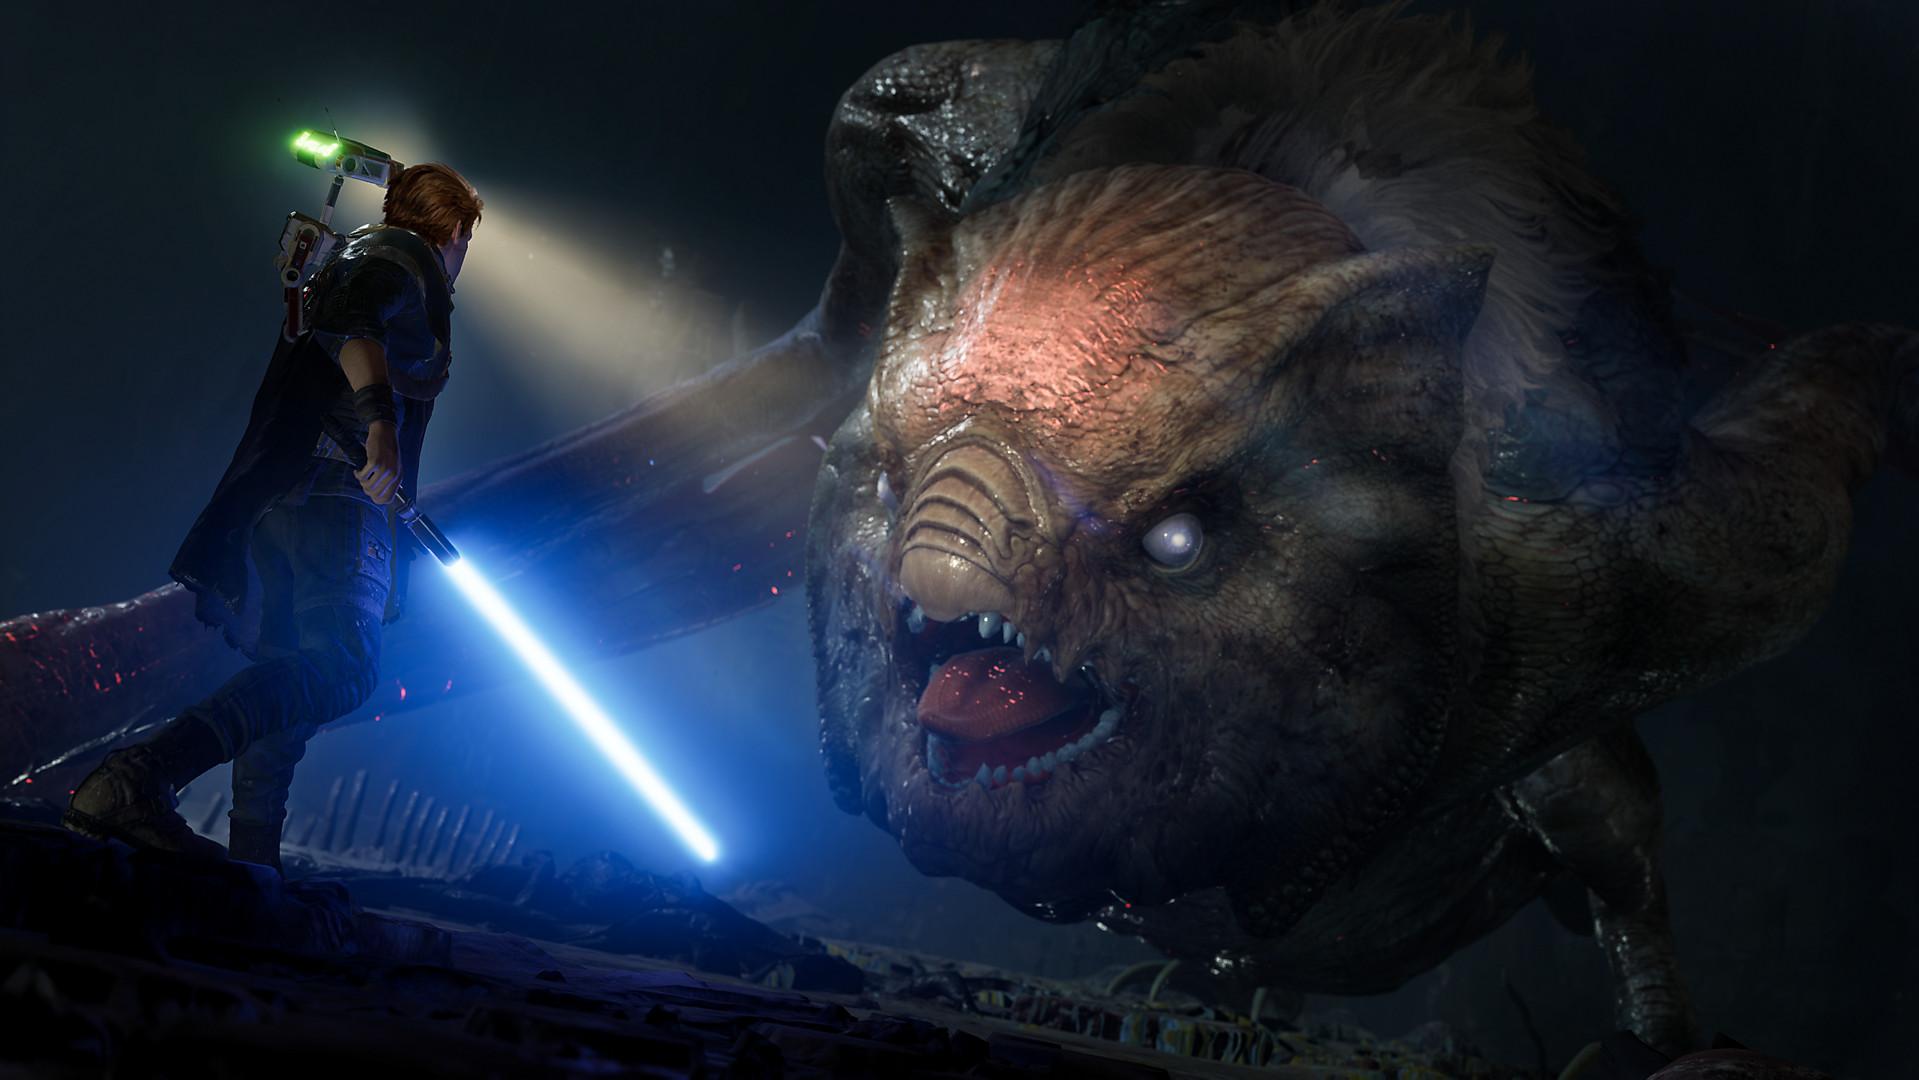 star-wars-jedi-fallen-order-pc-screenshot-04